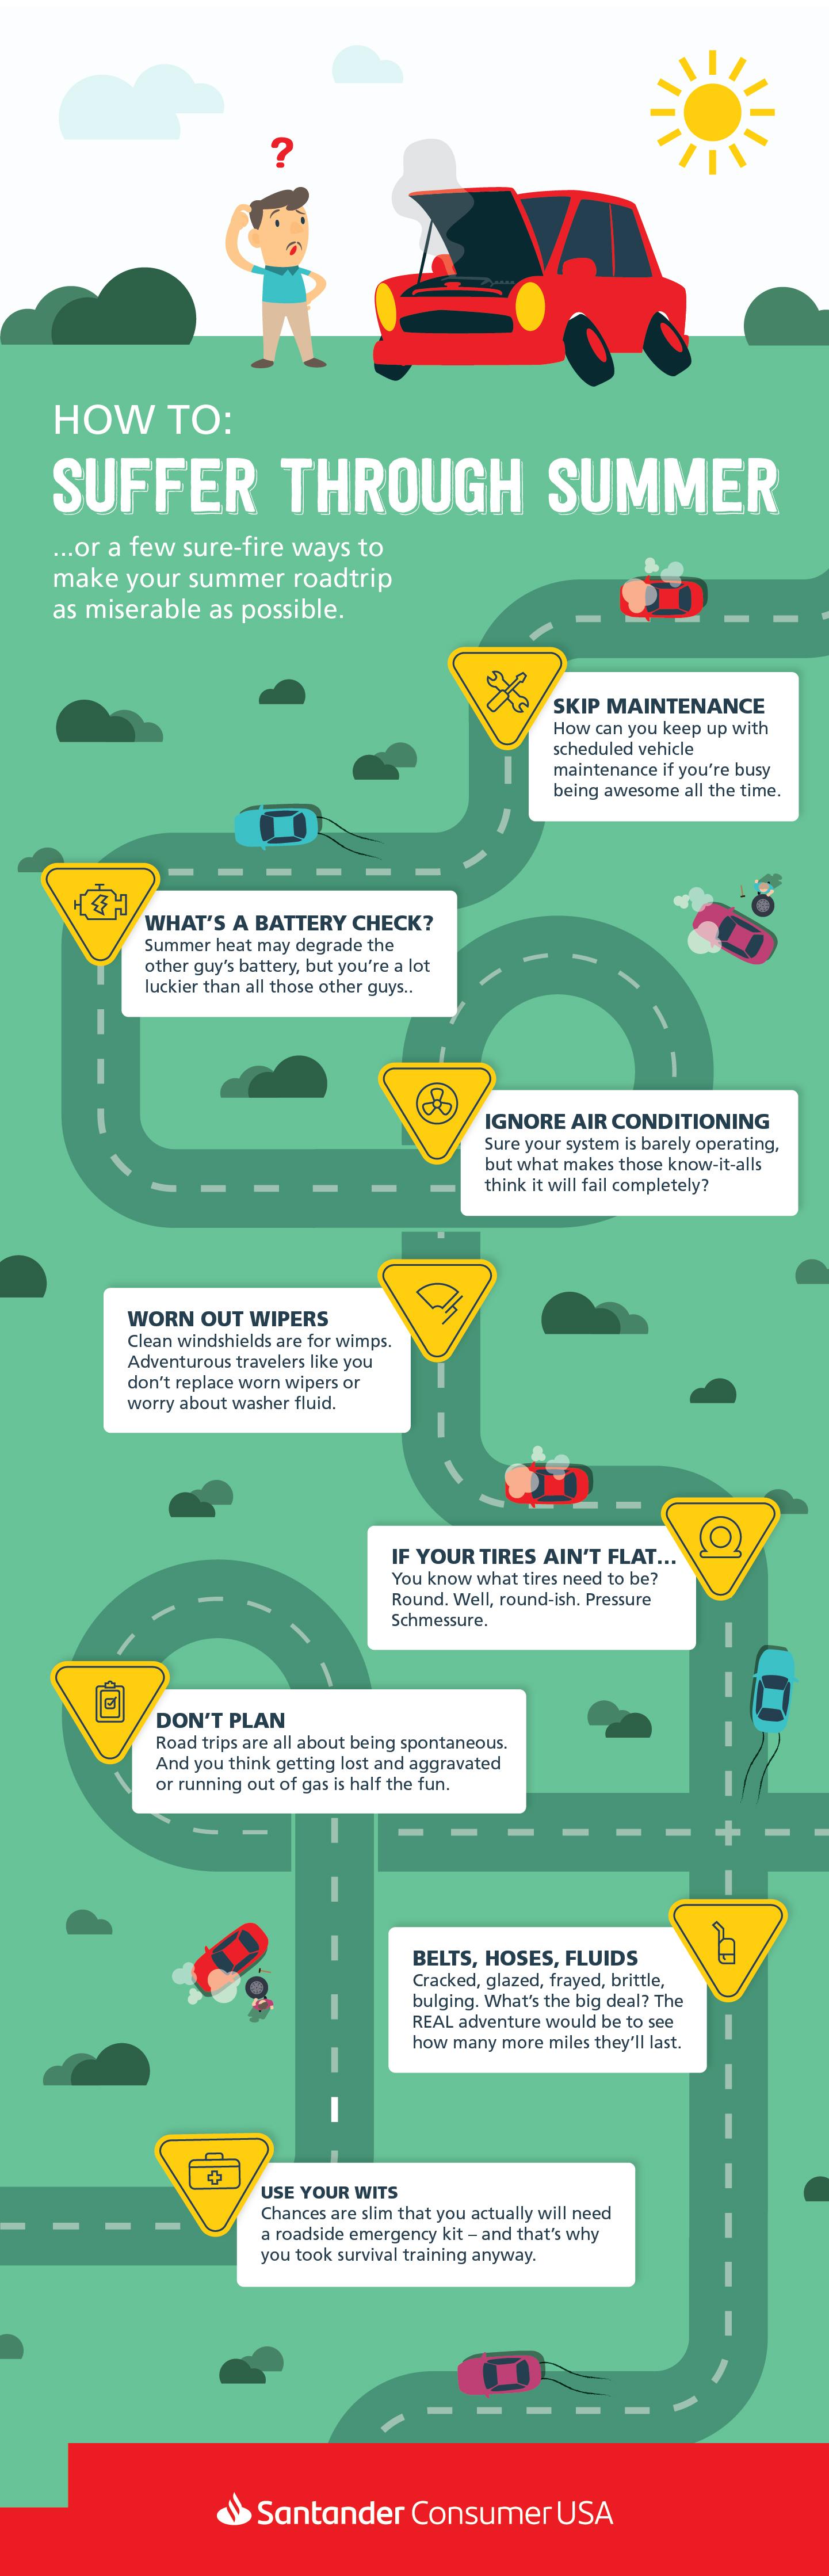 Suffer through summer infographic